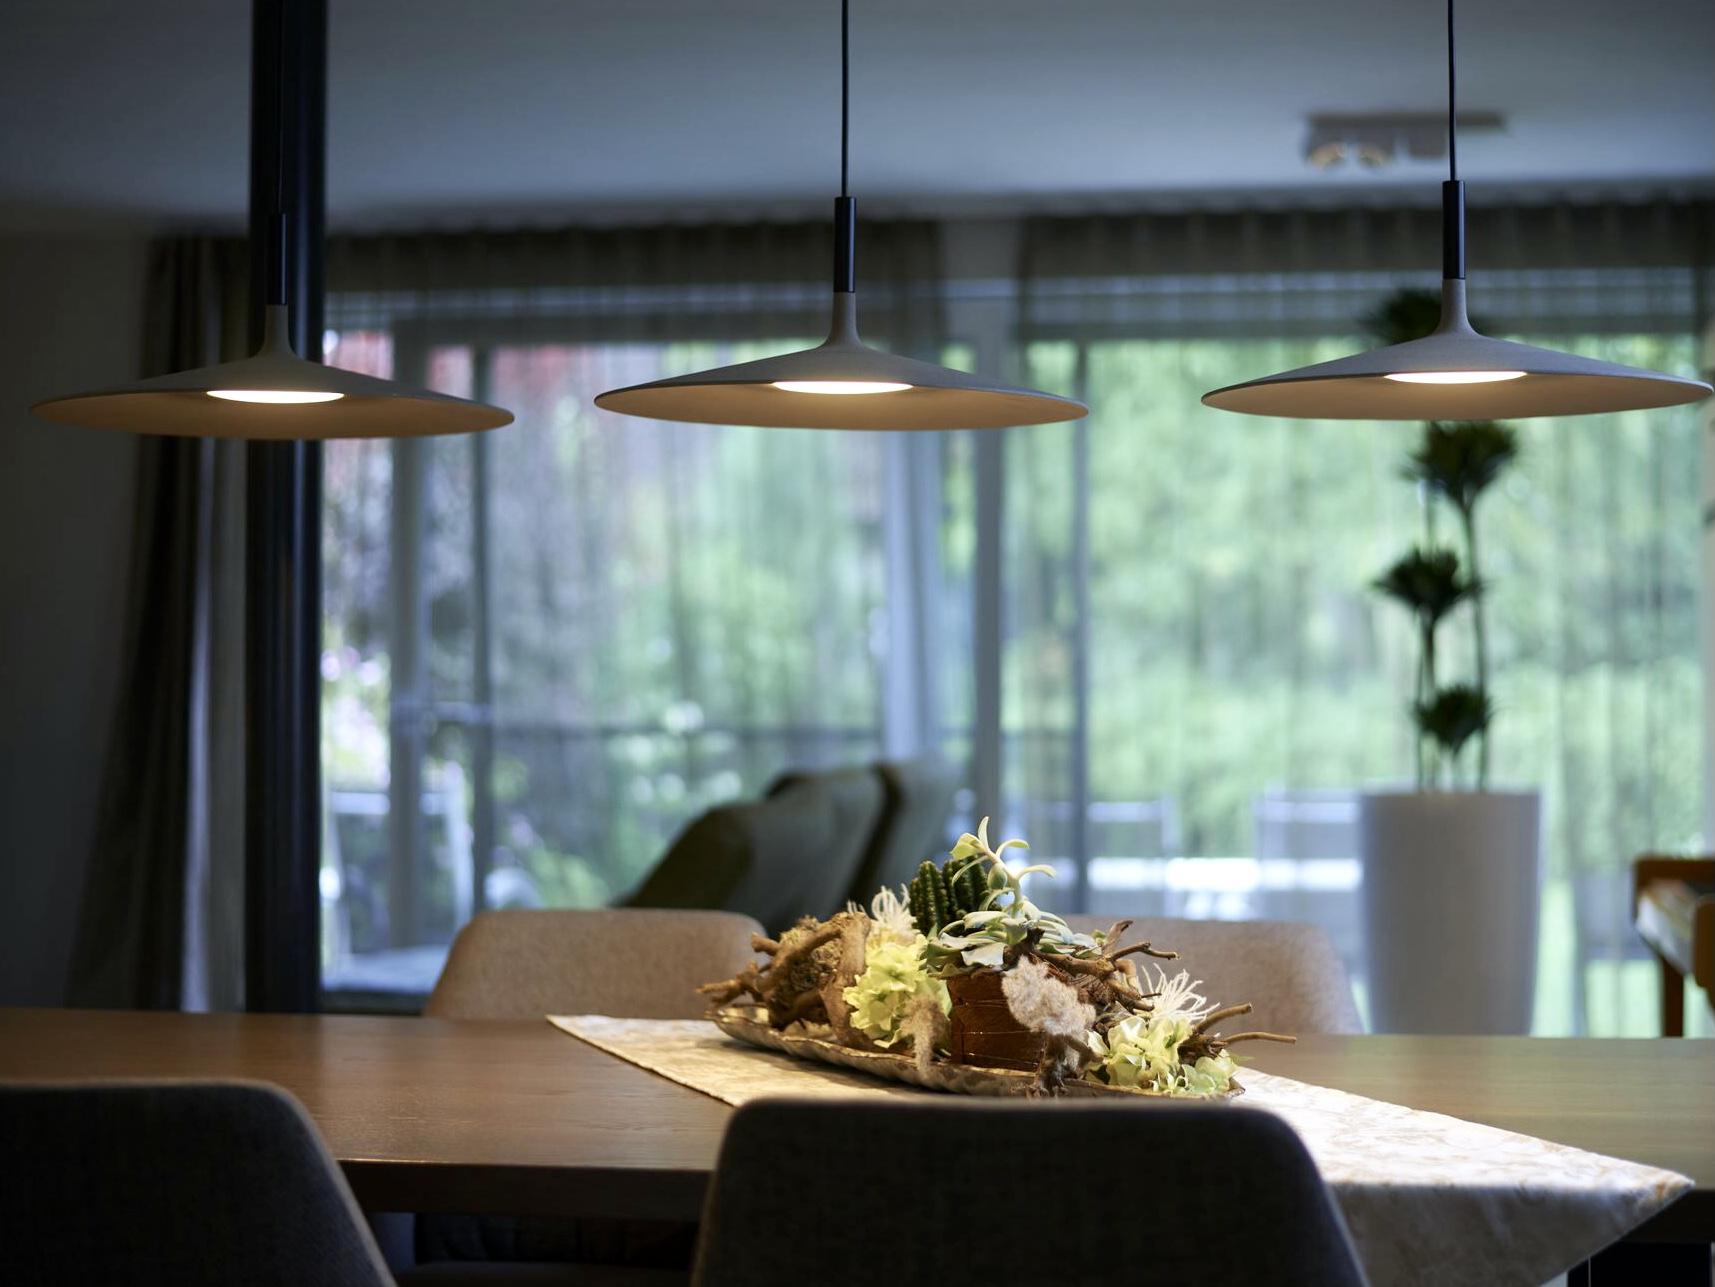 www.ideenraumgeben.de-renovierung-eines-wohnraums-mit-effektfeuer-38fe47e0-d29b-4469-9020-1c3d06d5f33f